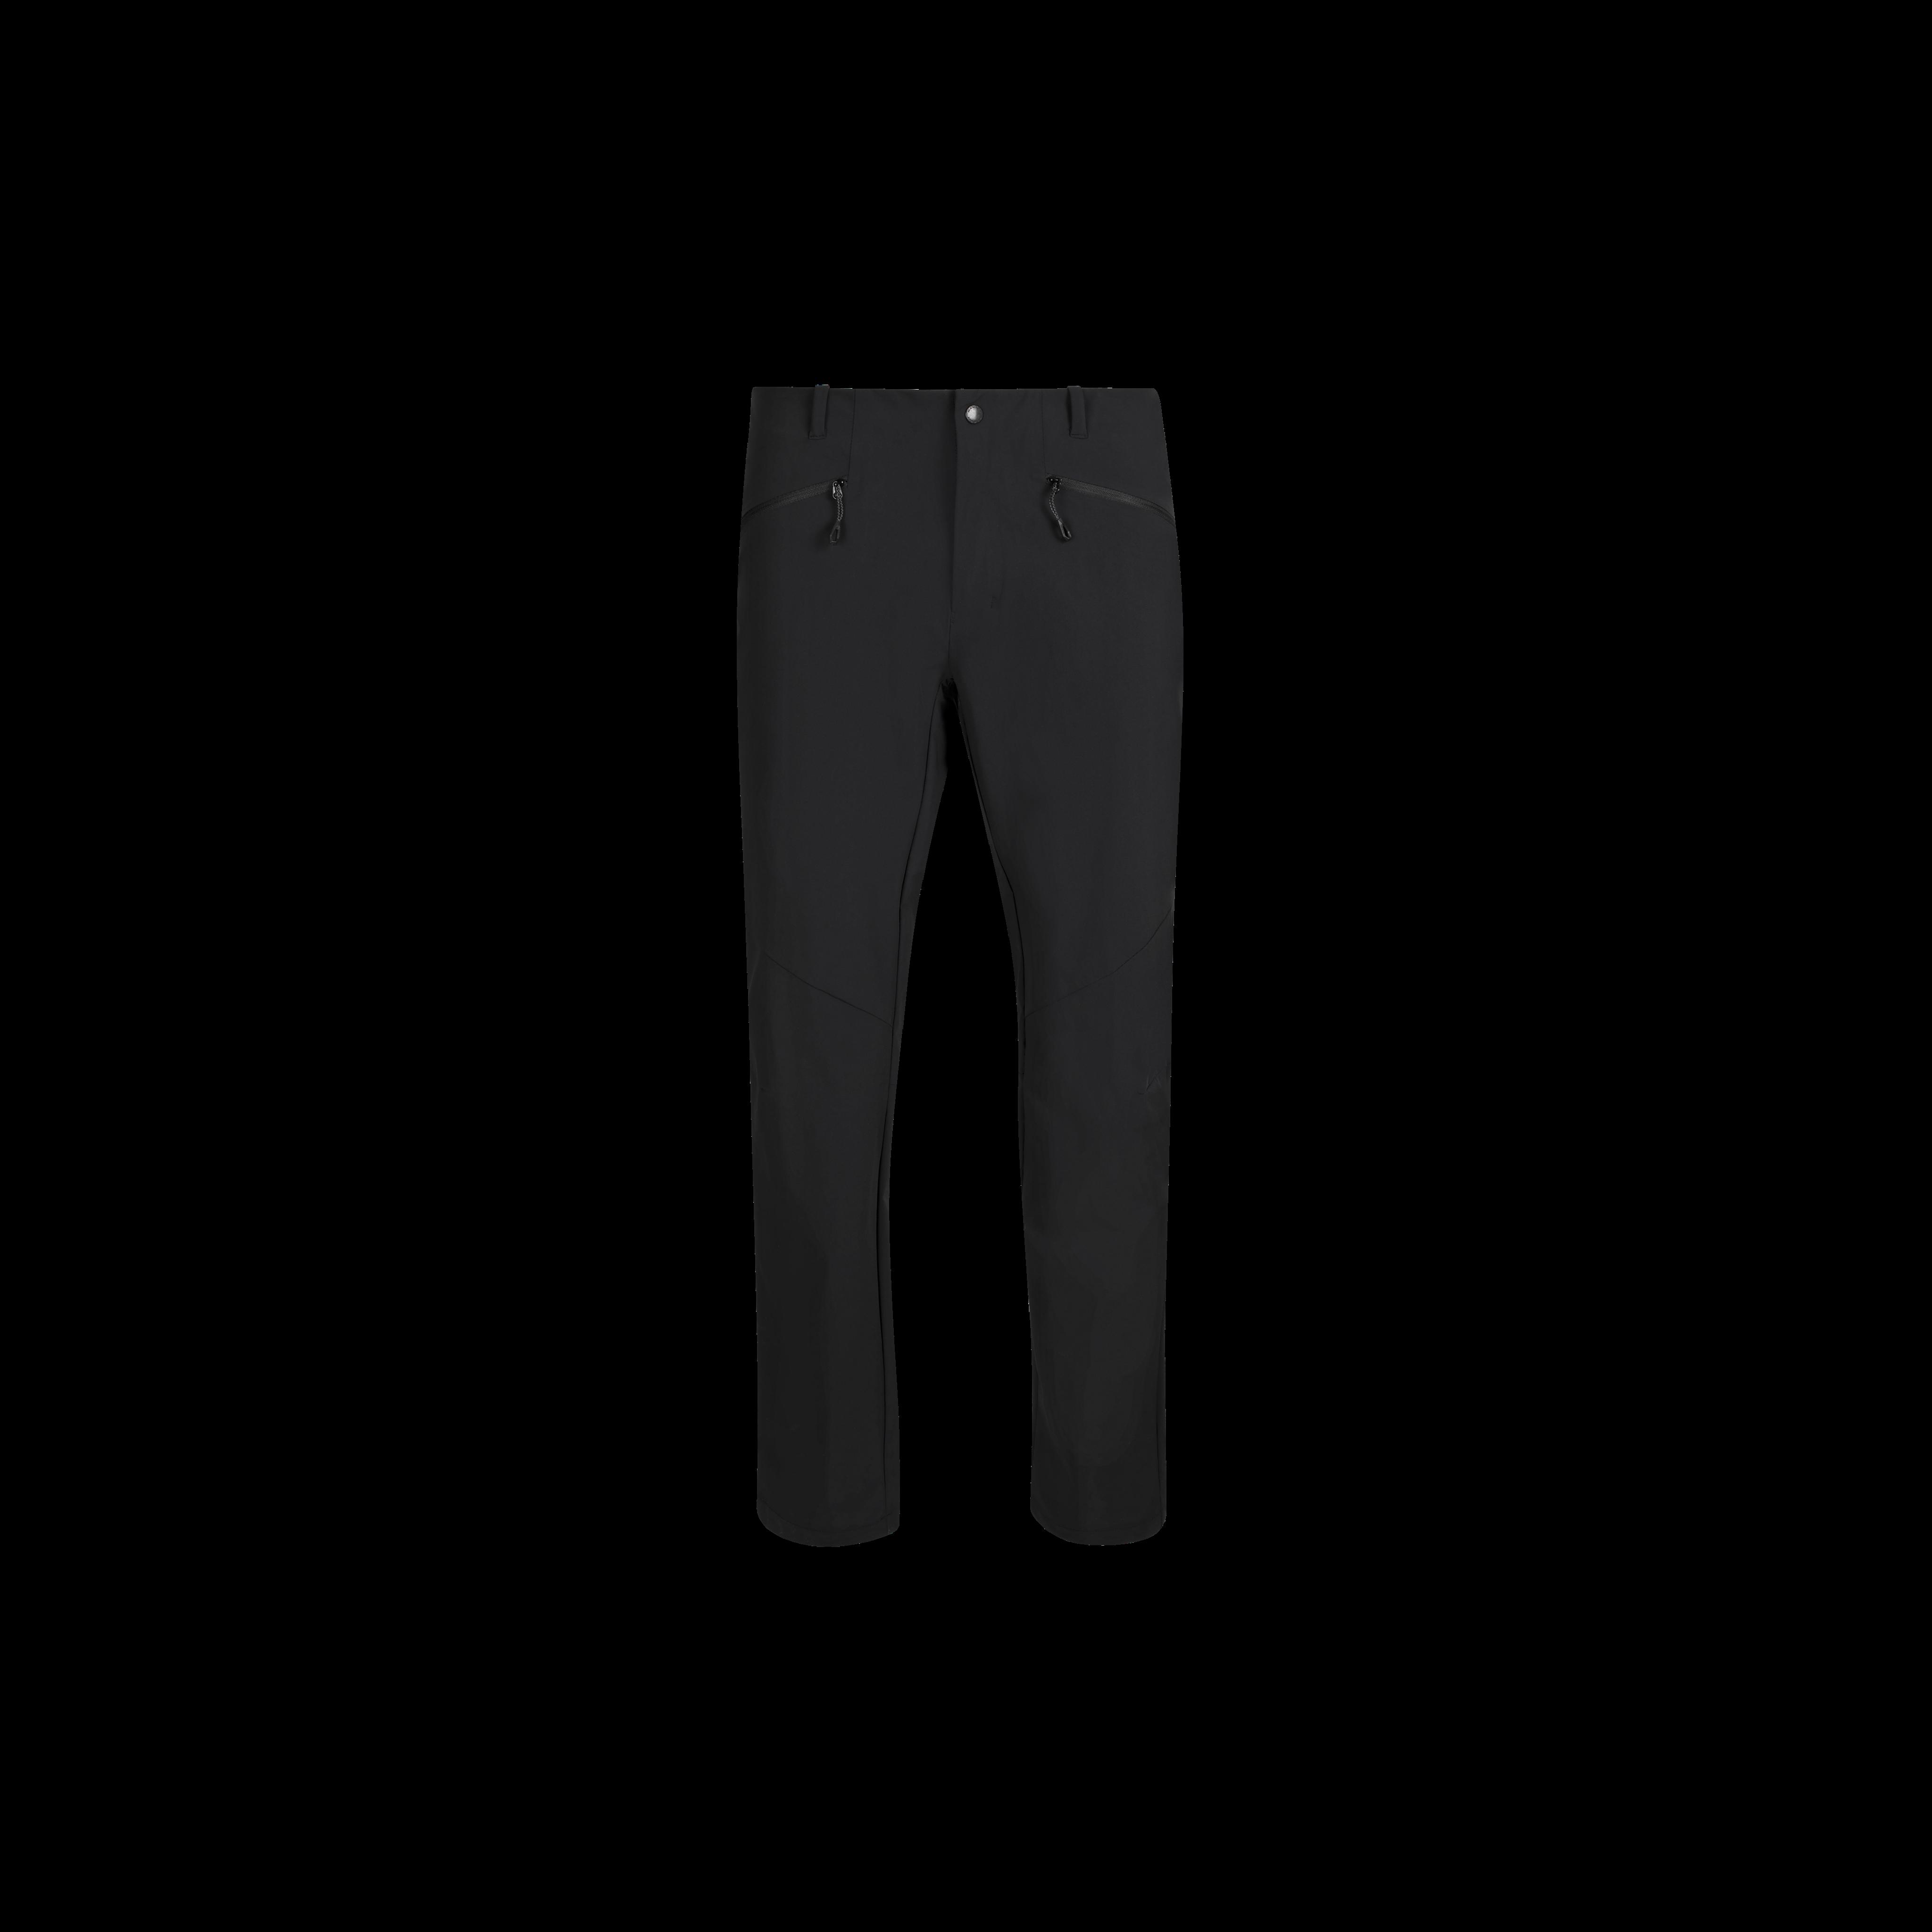 Macun SO Pants Men - black, short, UK 40 thumbnail